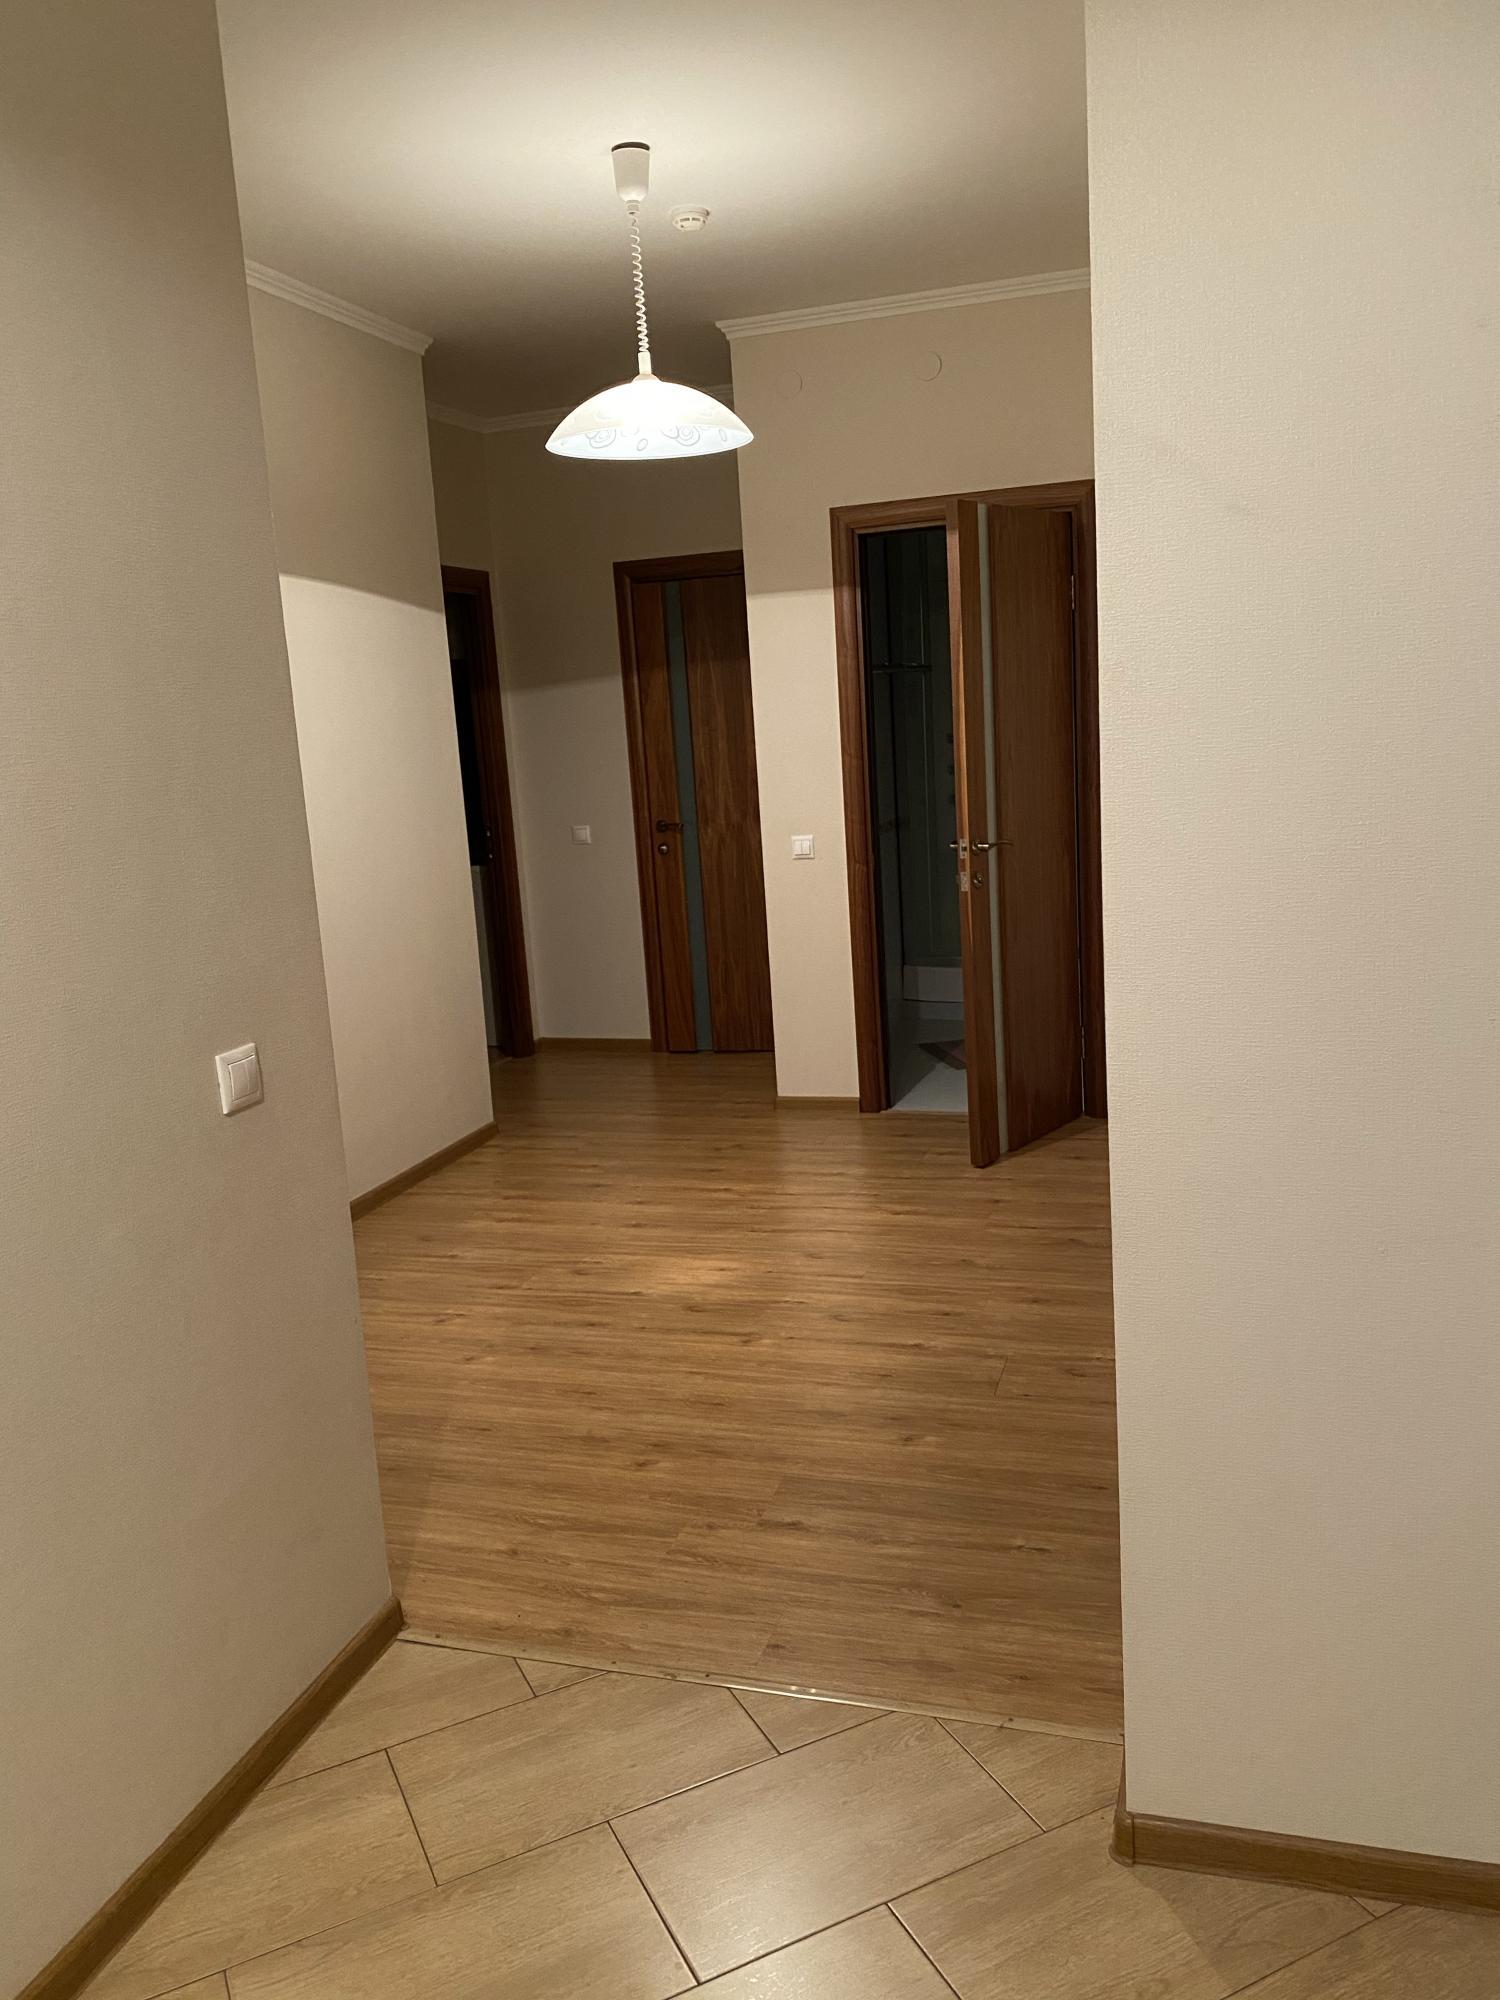 2к квартира Капитанская улица, 6 | 30000 | аренда в Красноярске фото 9